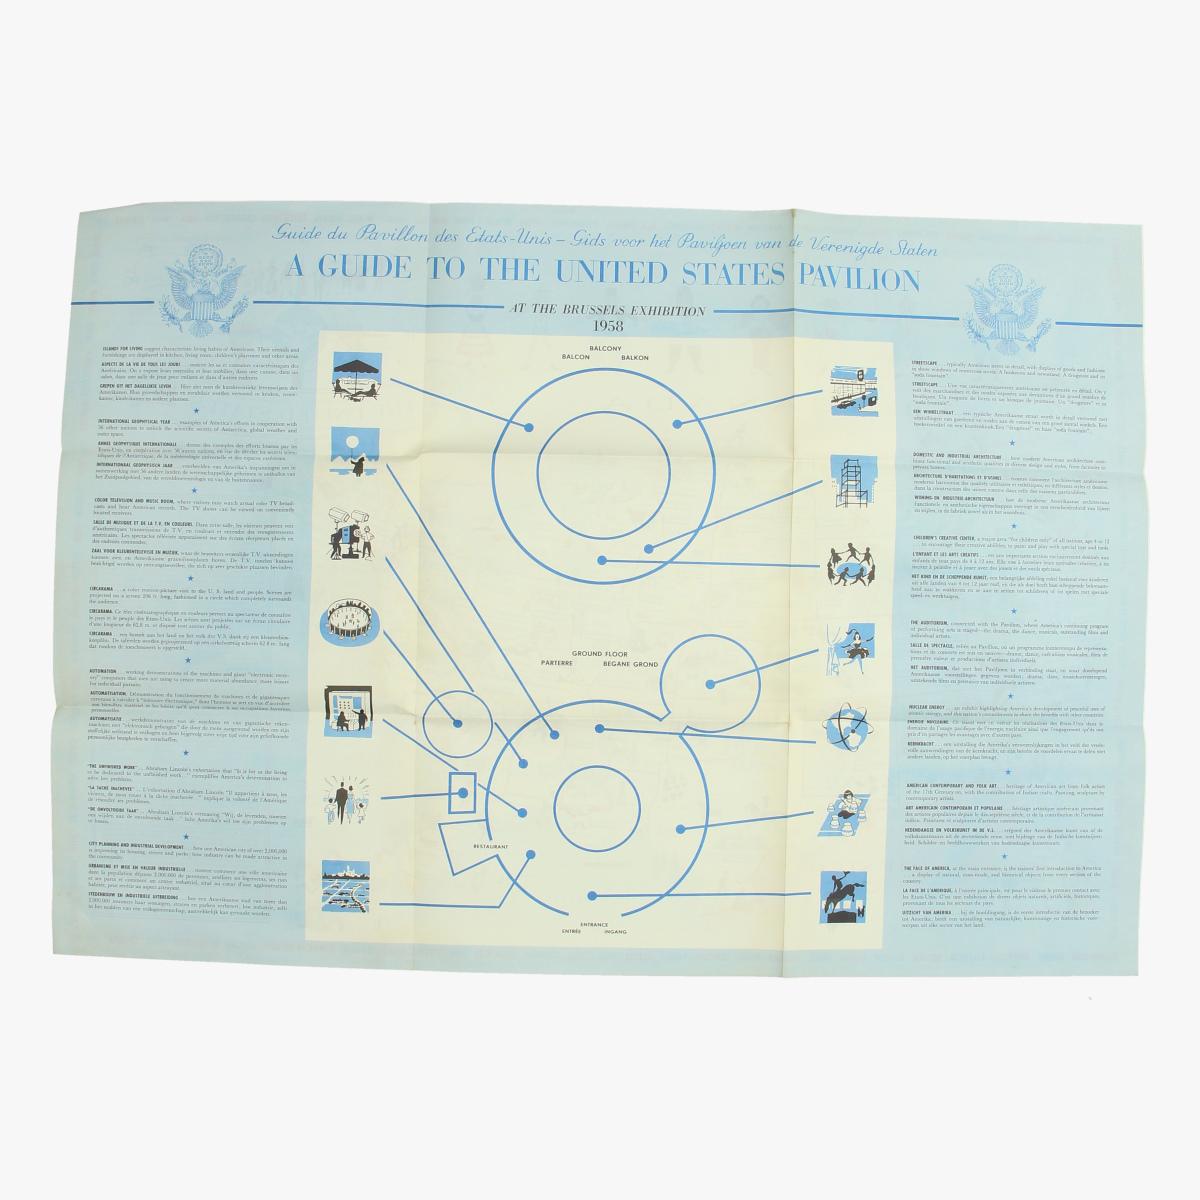 Afbeeldingen van expo 58 guide to de united states pavilion